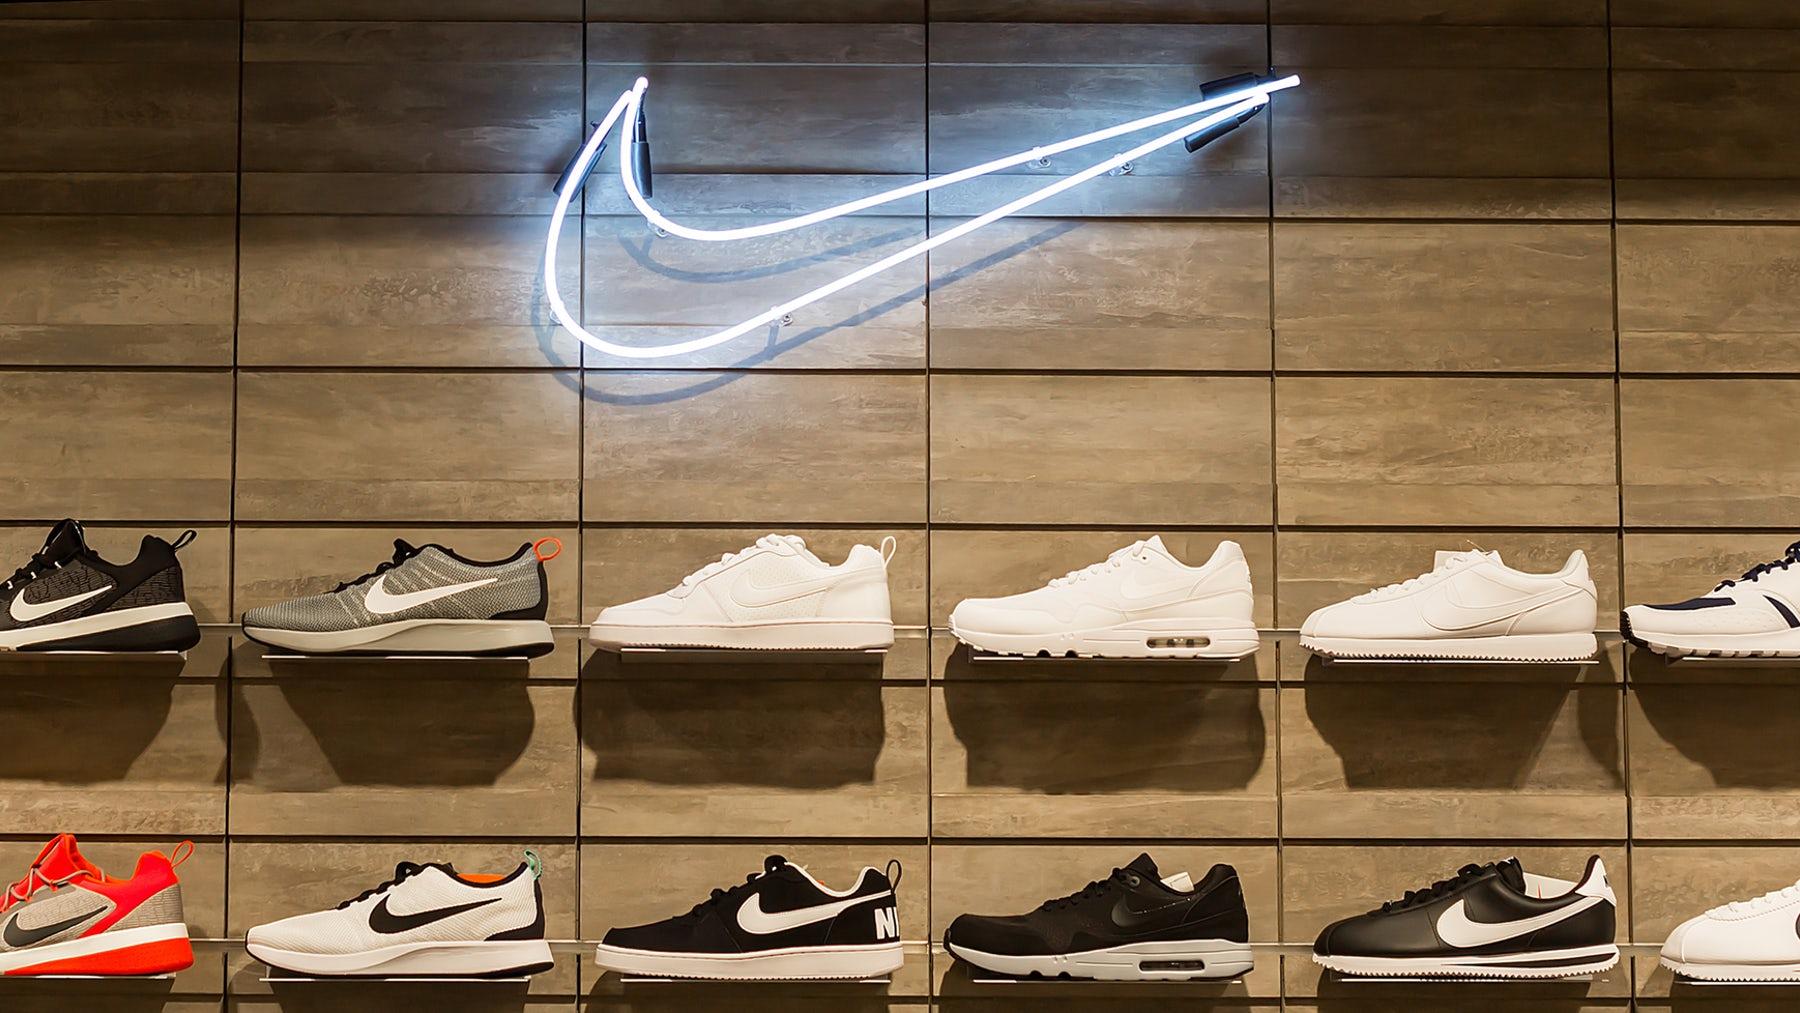 Nike store | Source: Shutterstock